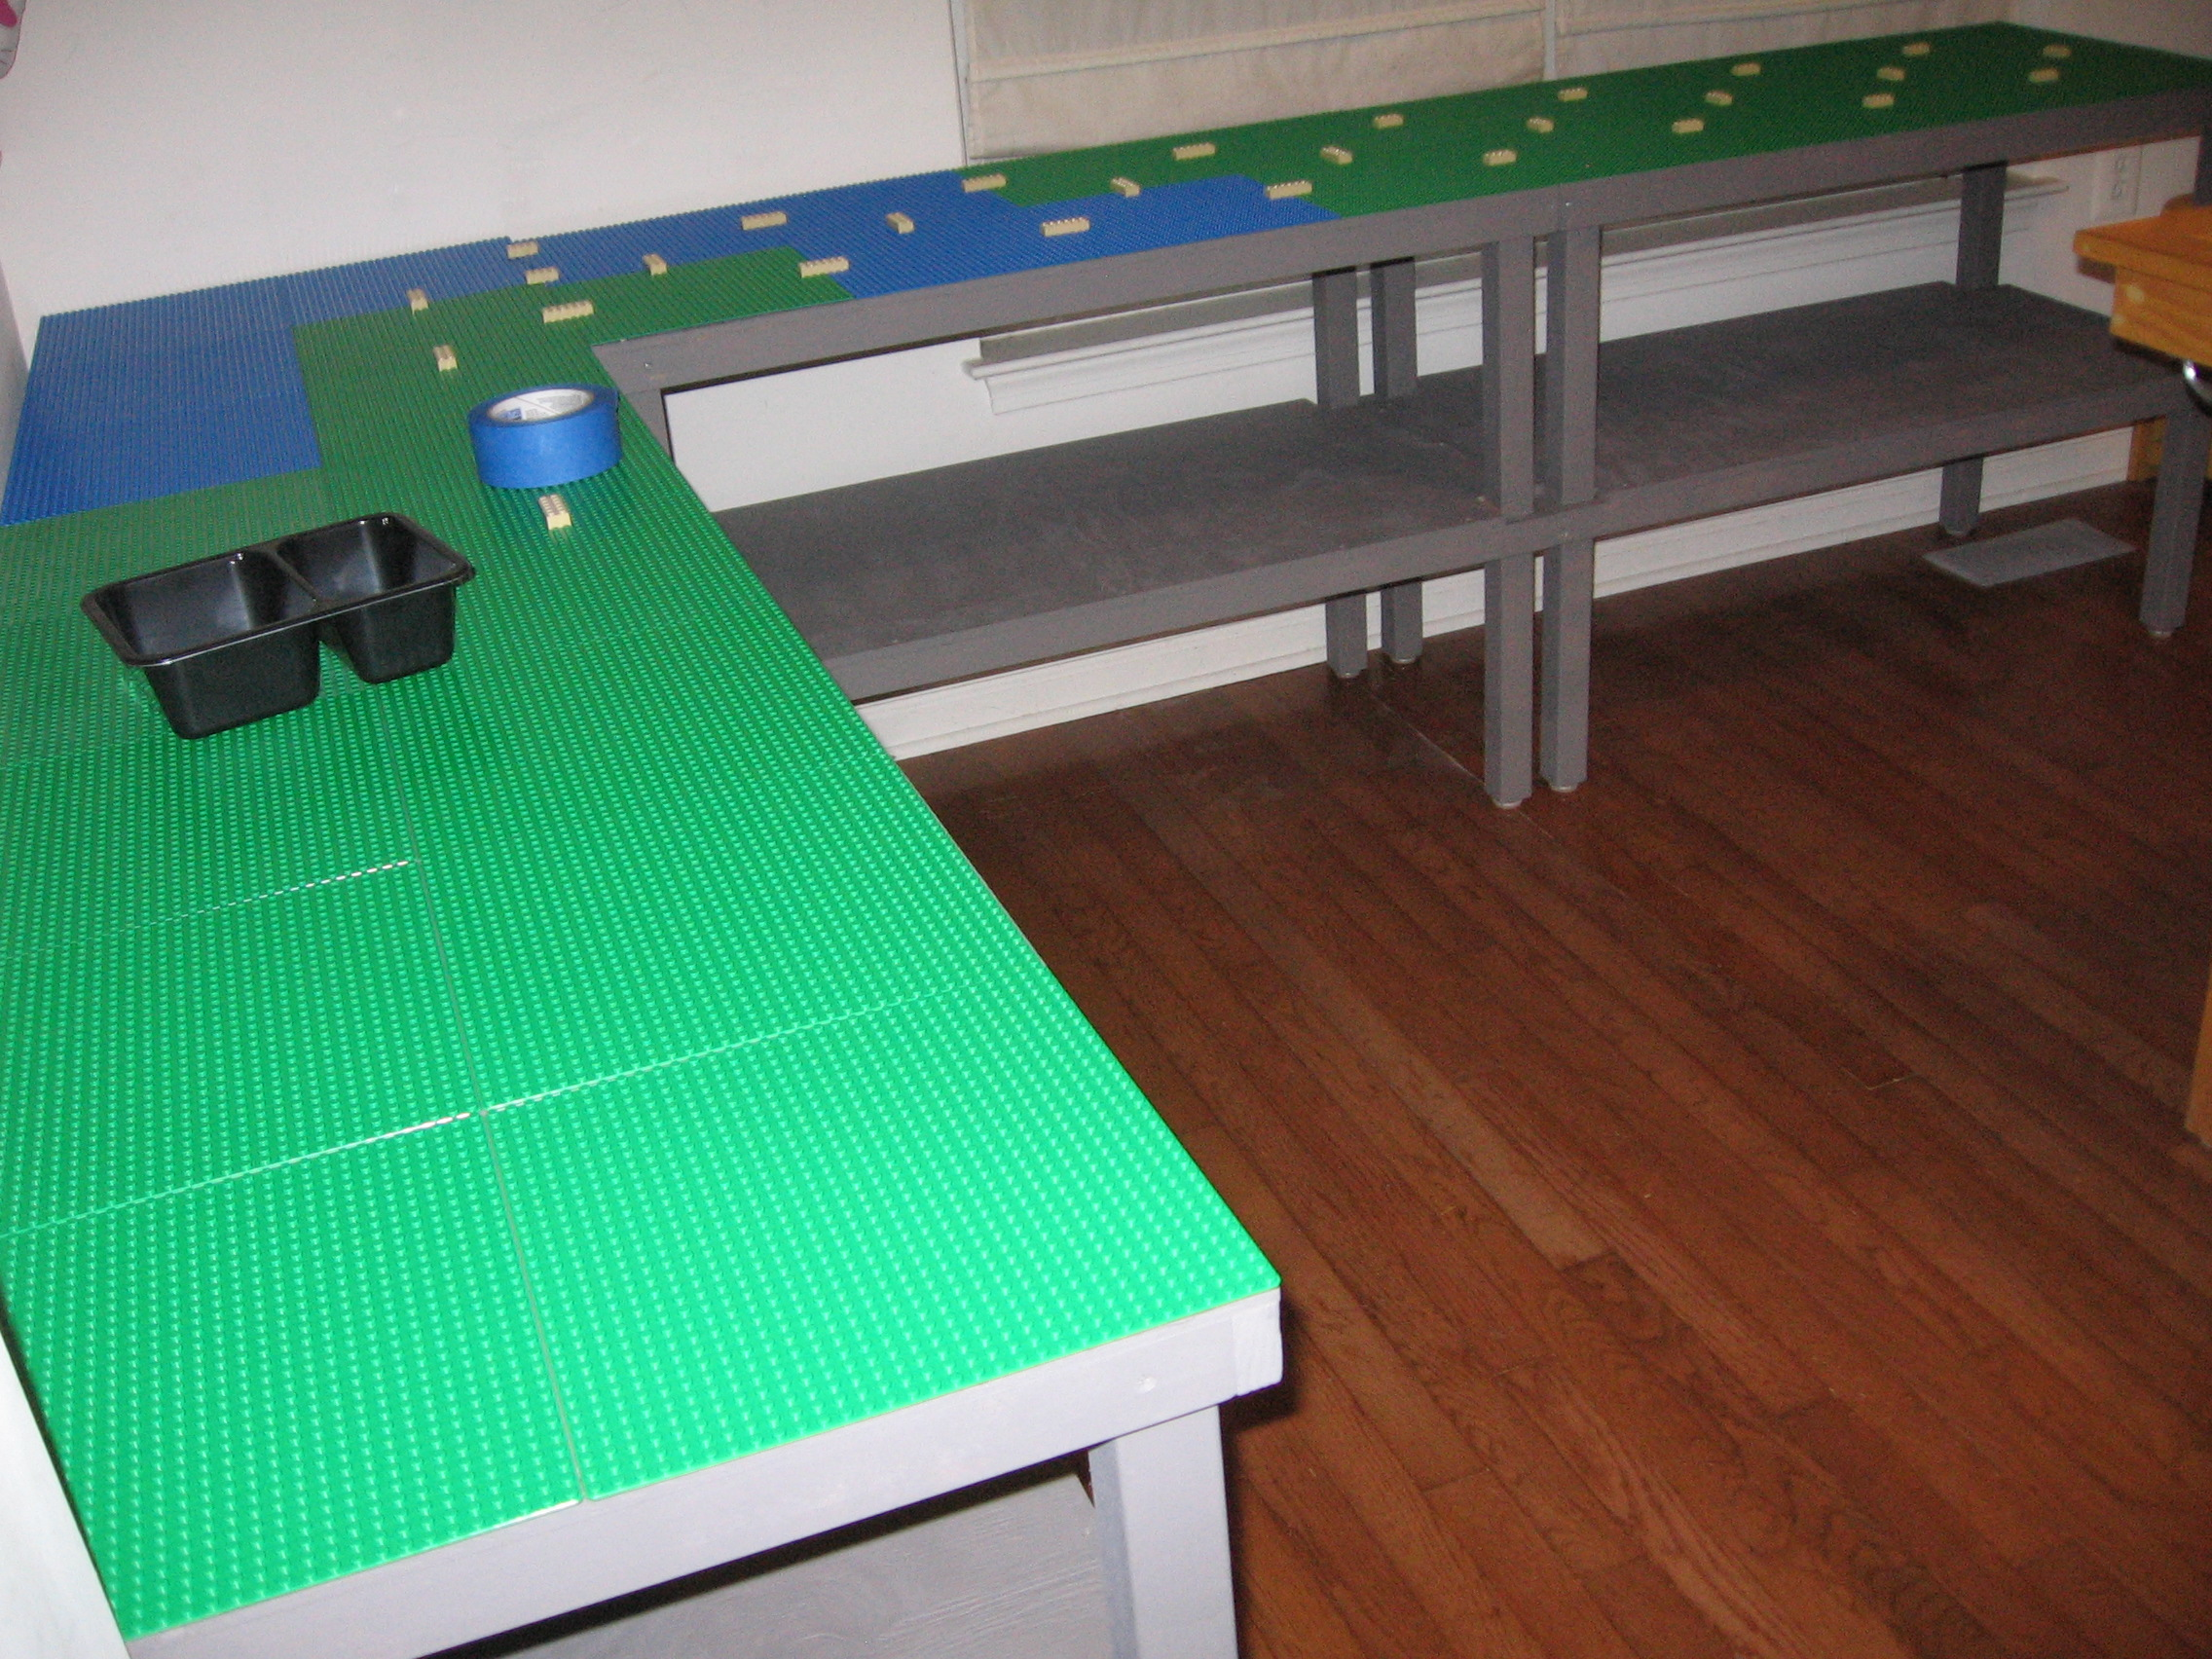 Lego Tables Step 3